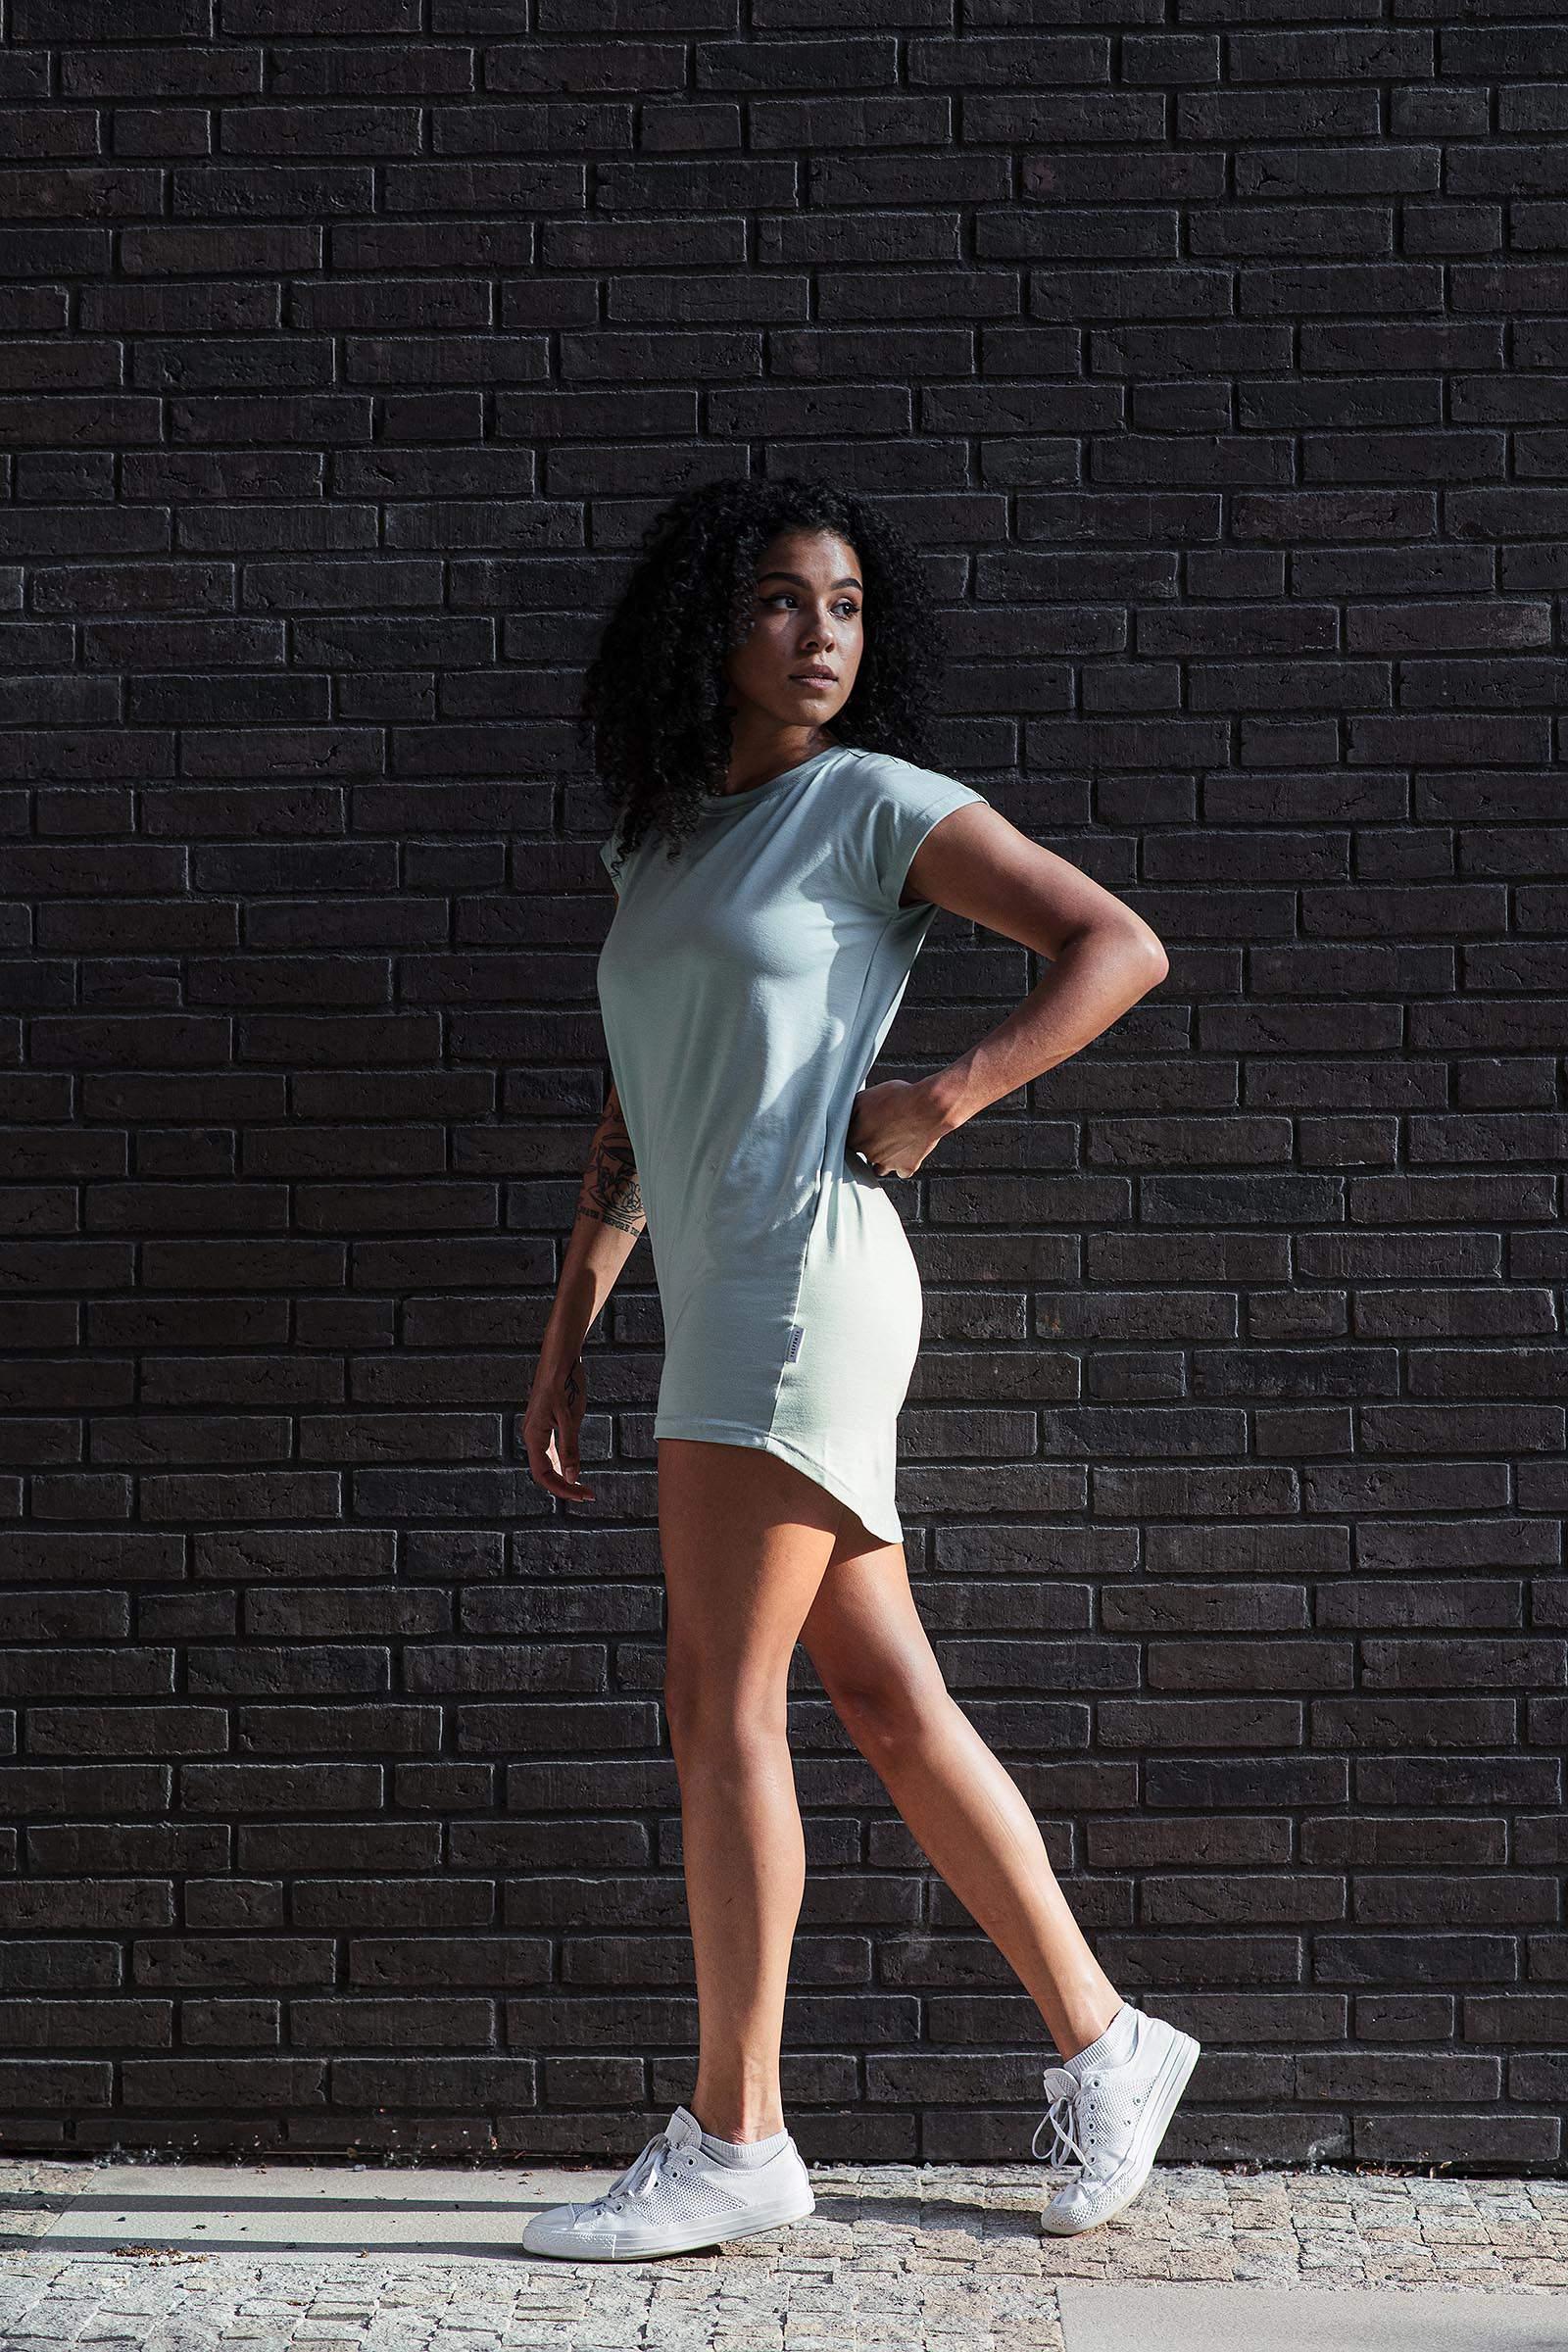 Dresses and skirts Naja sage